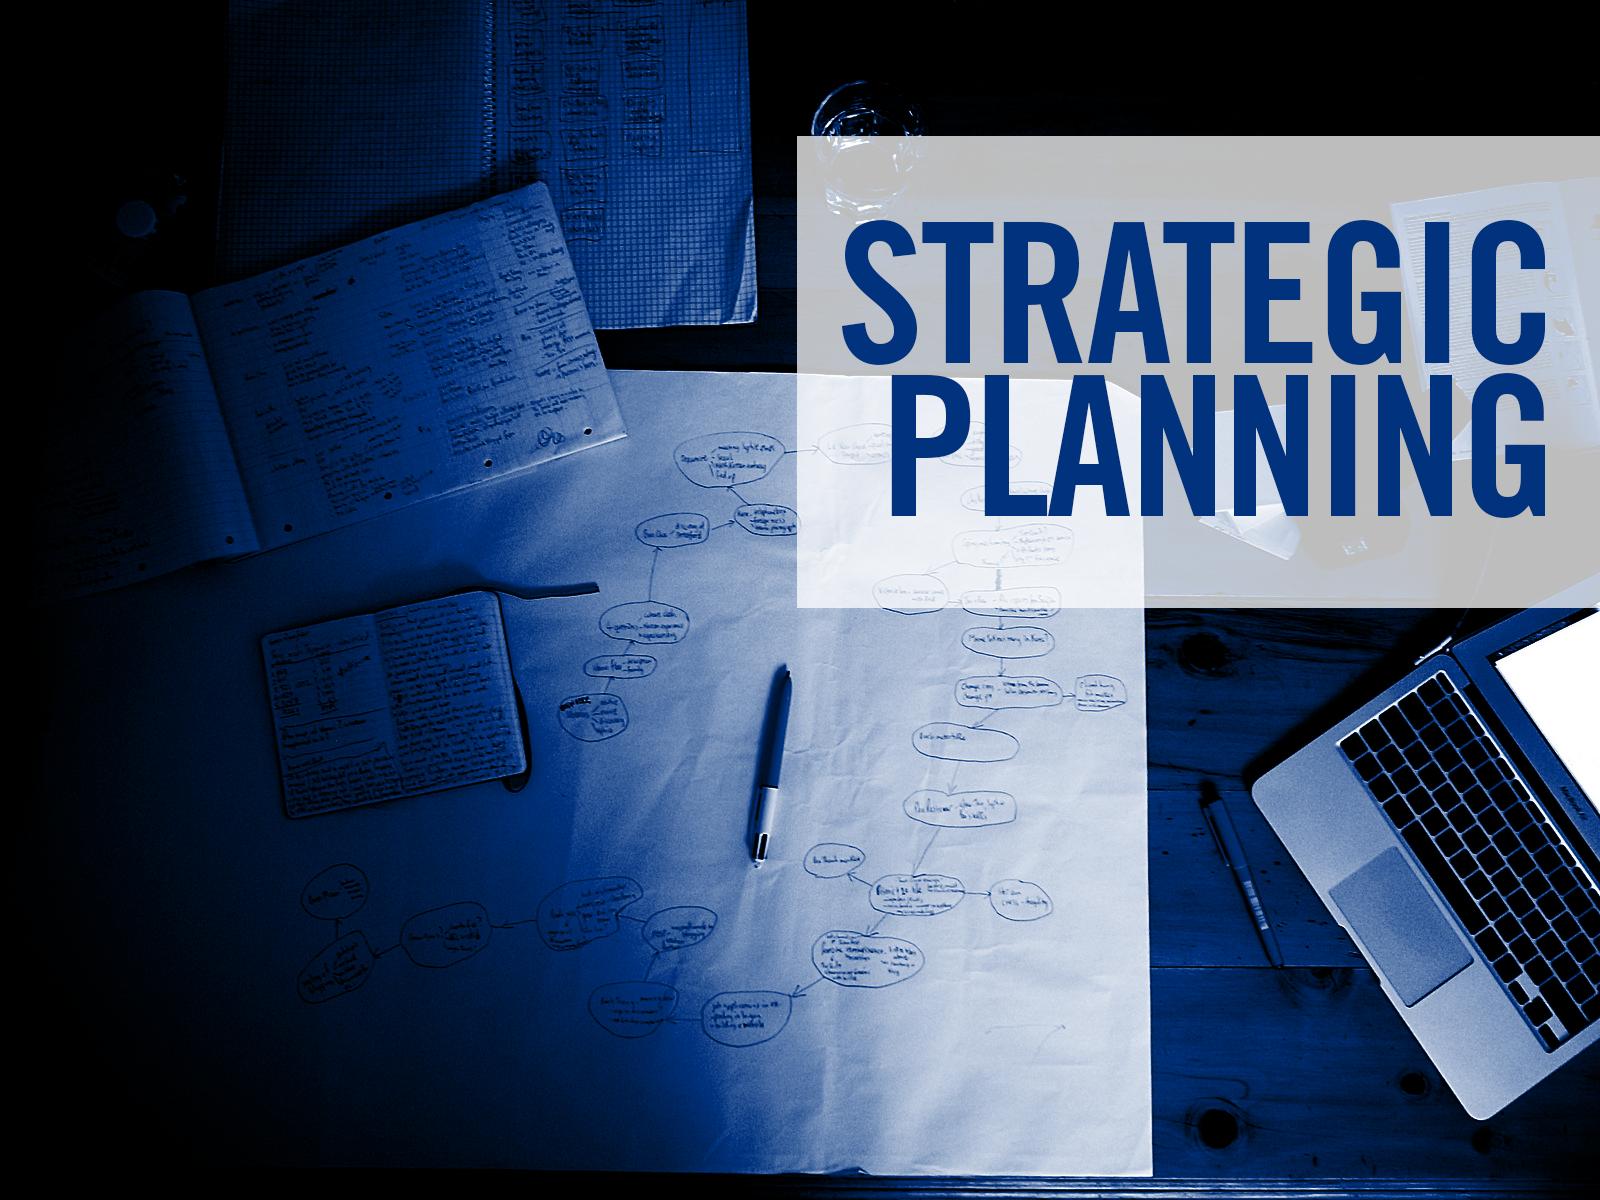 strategi planning